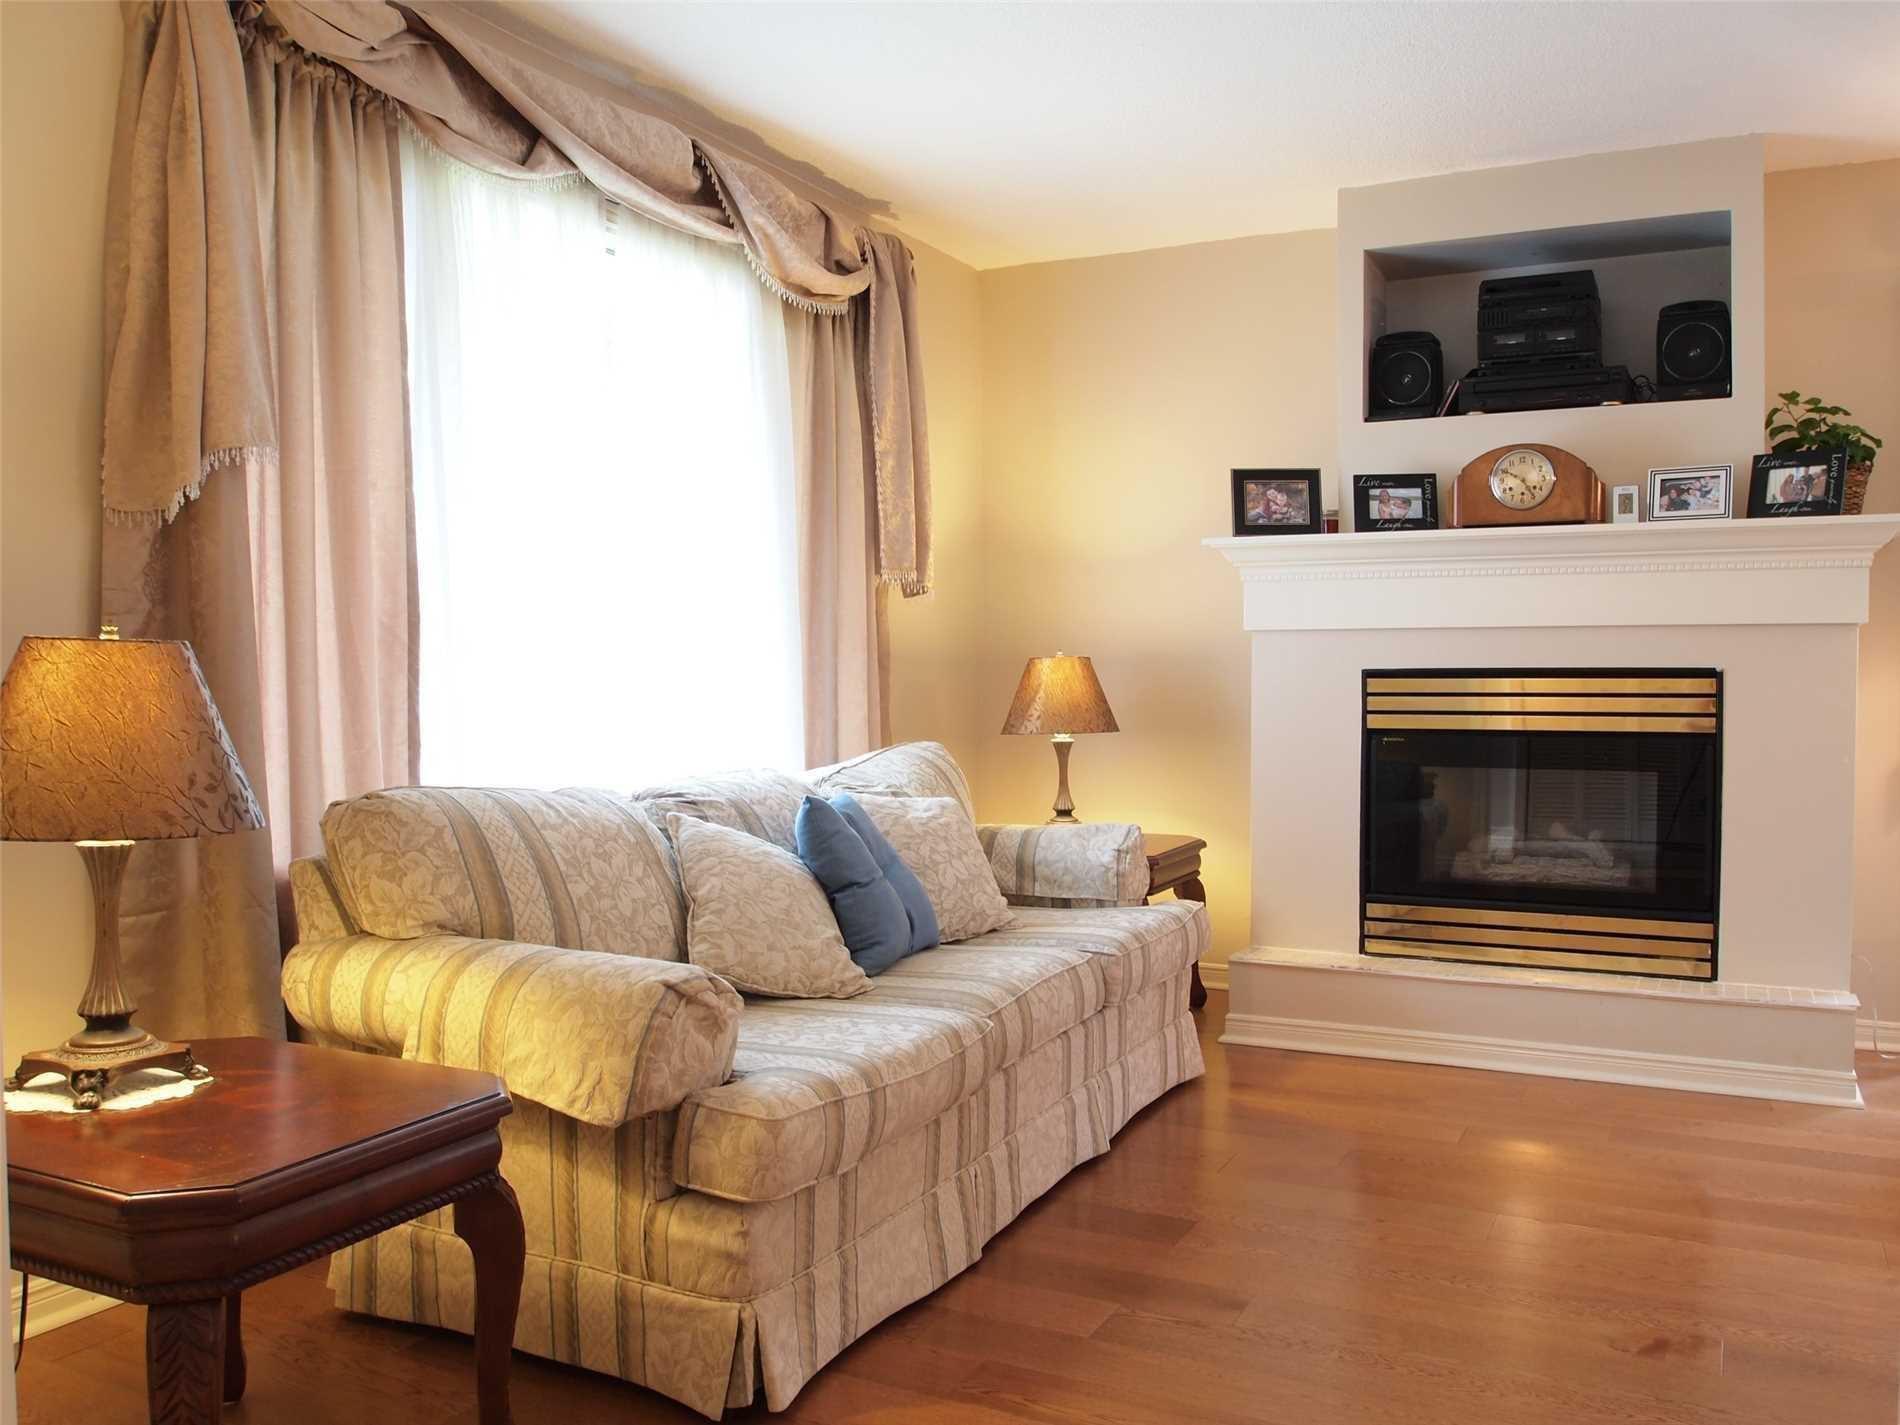 Photo 6: Photos: 105 Fifth Street in Brock: Beaverton House (Bungalow) for sale : MLS®# N4564596